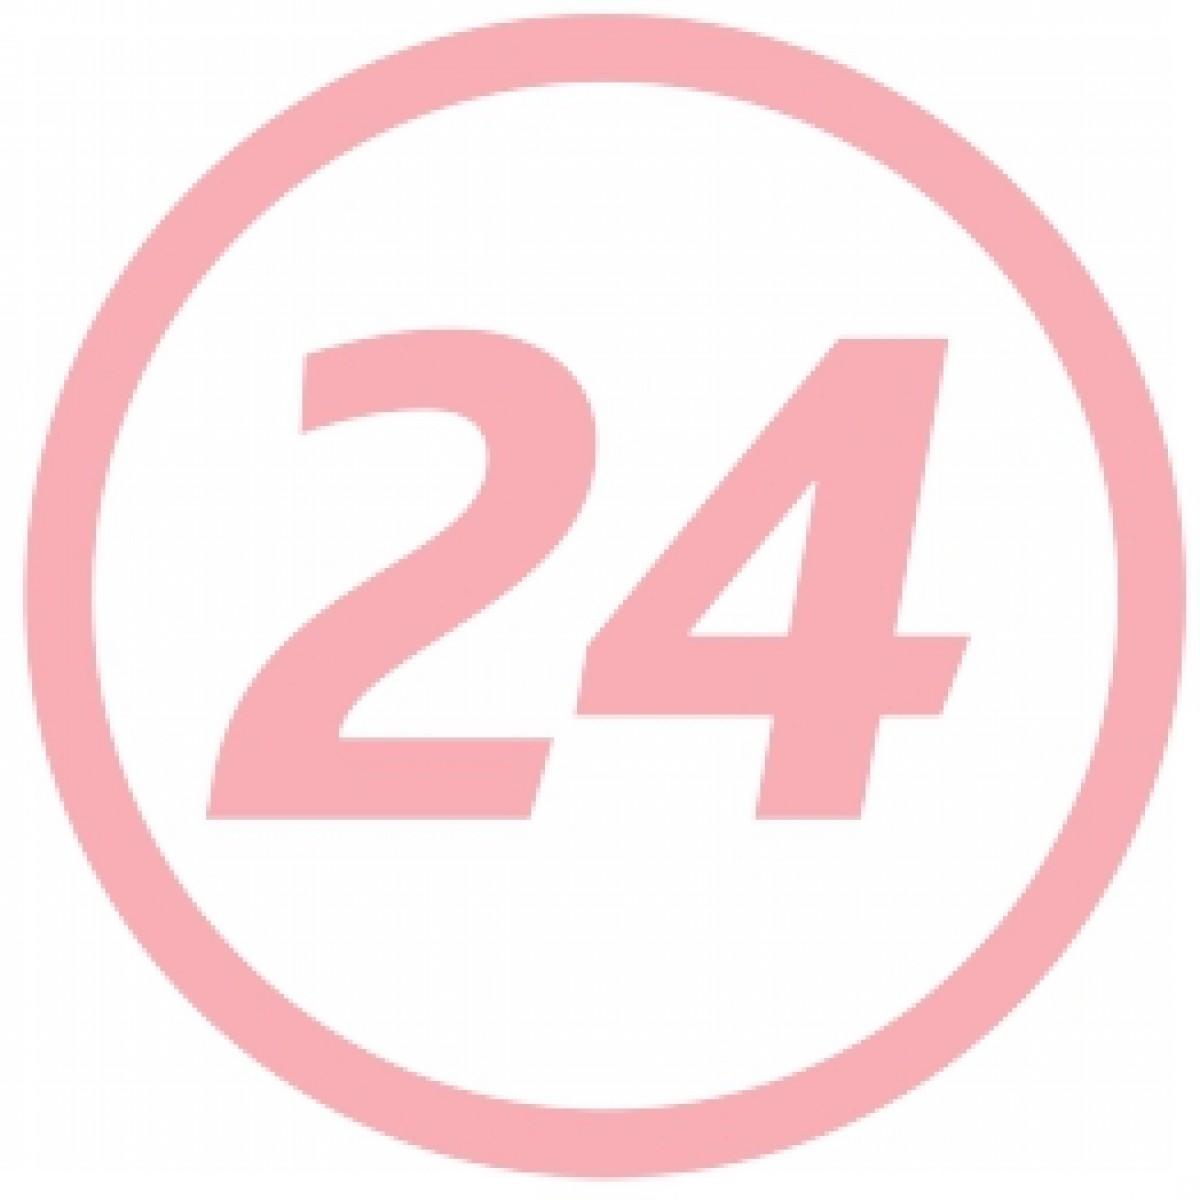 Hartmann Molicare Premium Lady Pad 3 Picaturi Tampoane pentru Incontinenta Usoara, Tampoane, 14buc